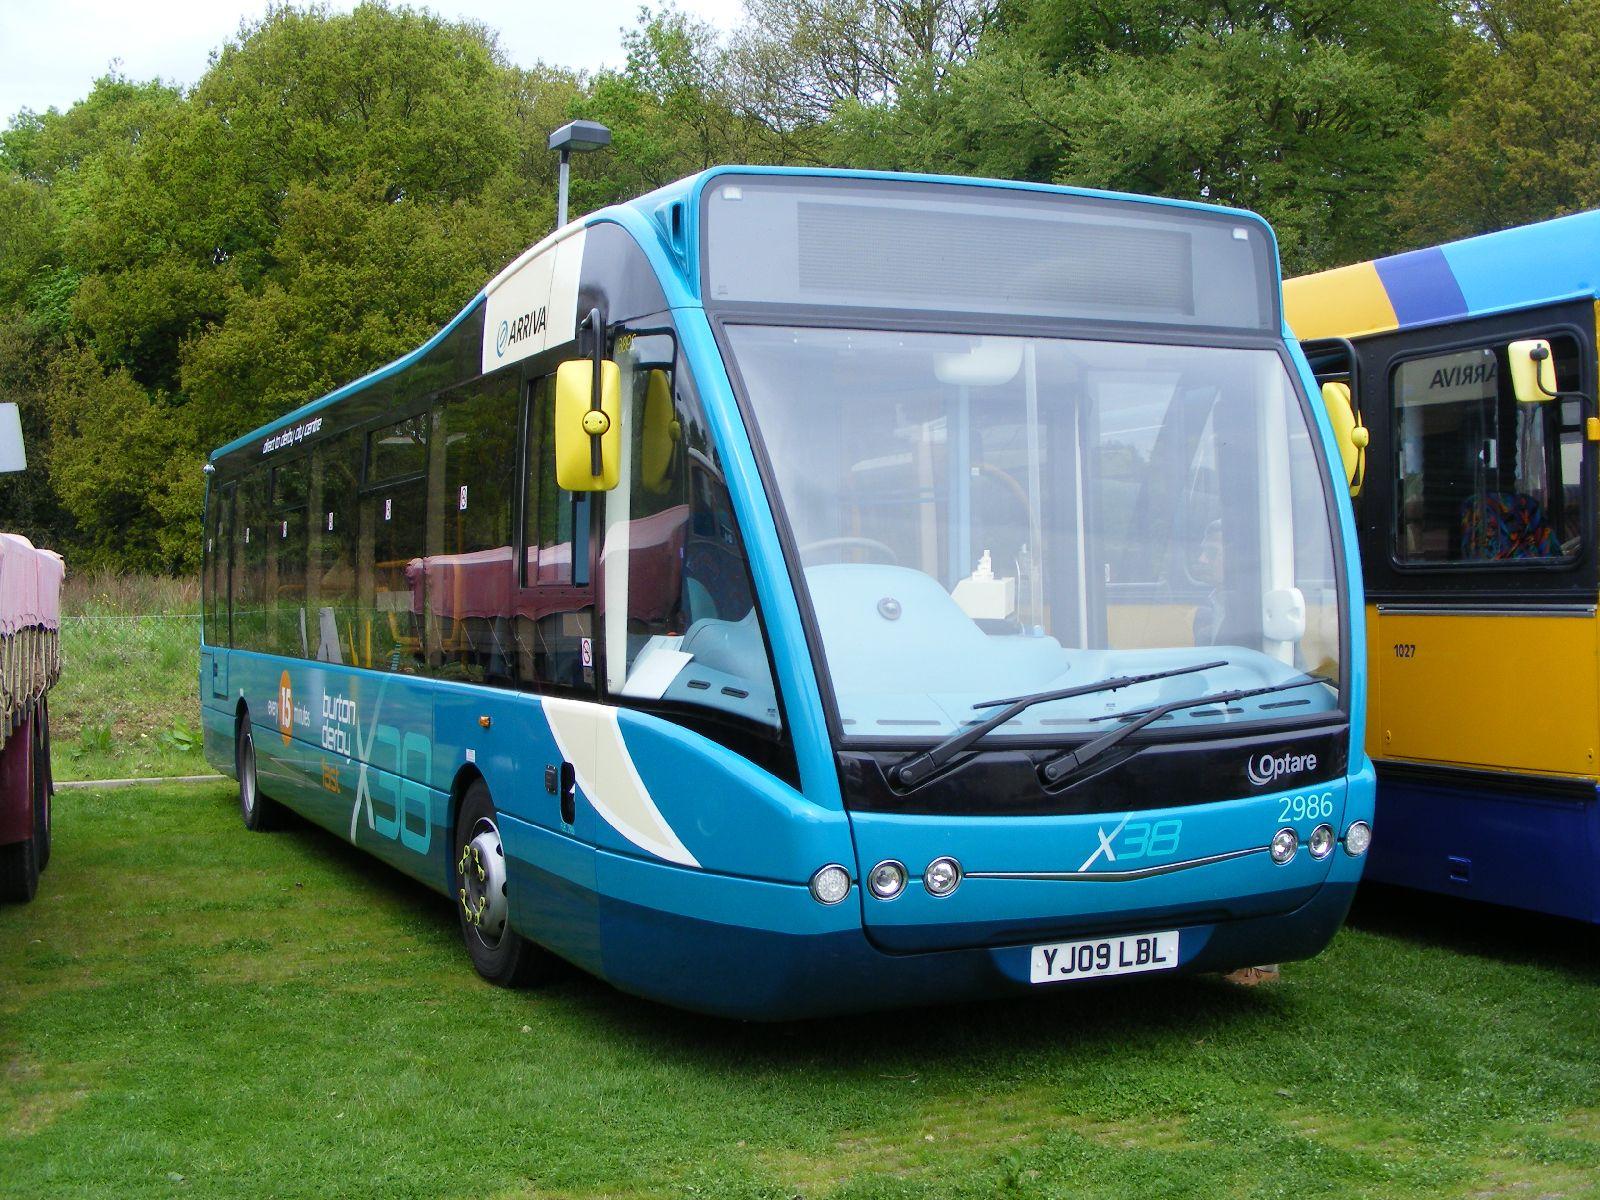 Arriva_bus_2986_%28YJ09_LBL%29%2C_2009_POPS_bus_rally